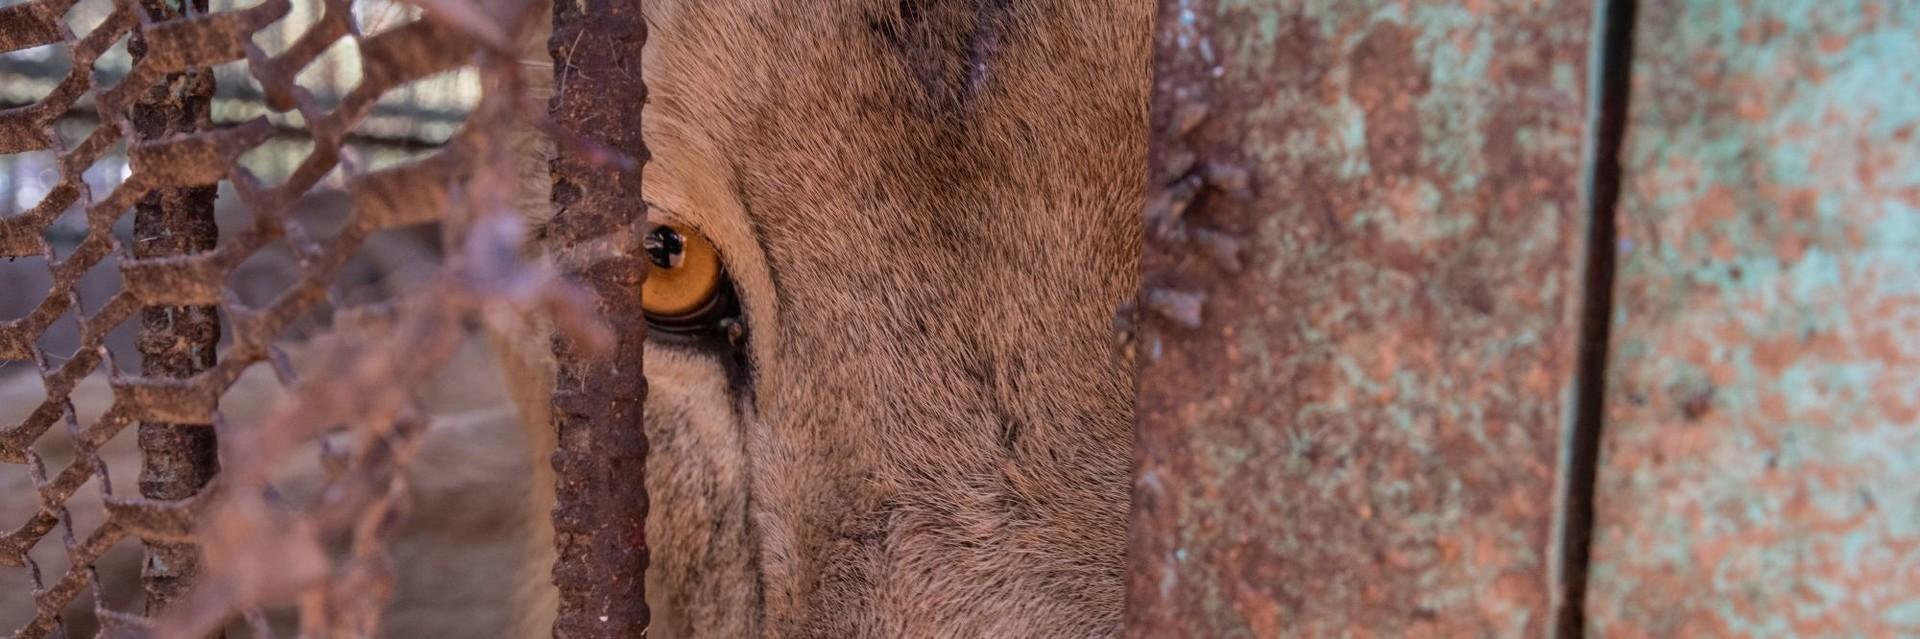 Hungernde Löwen im Sudan